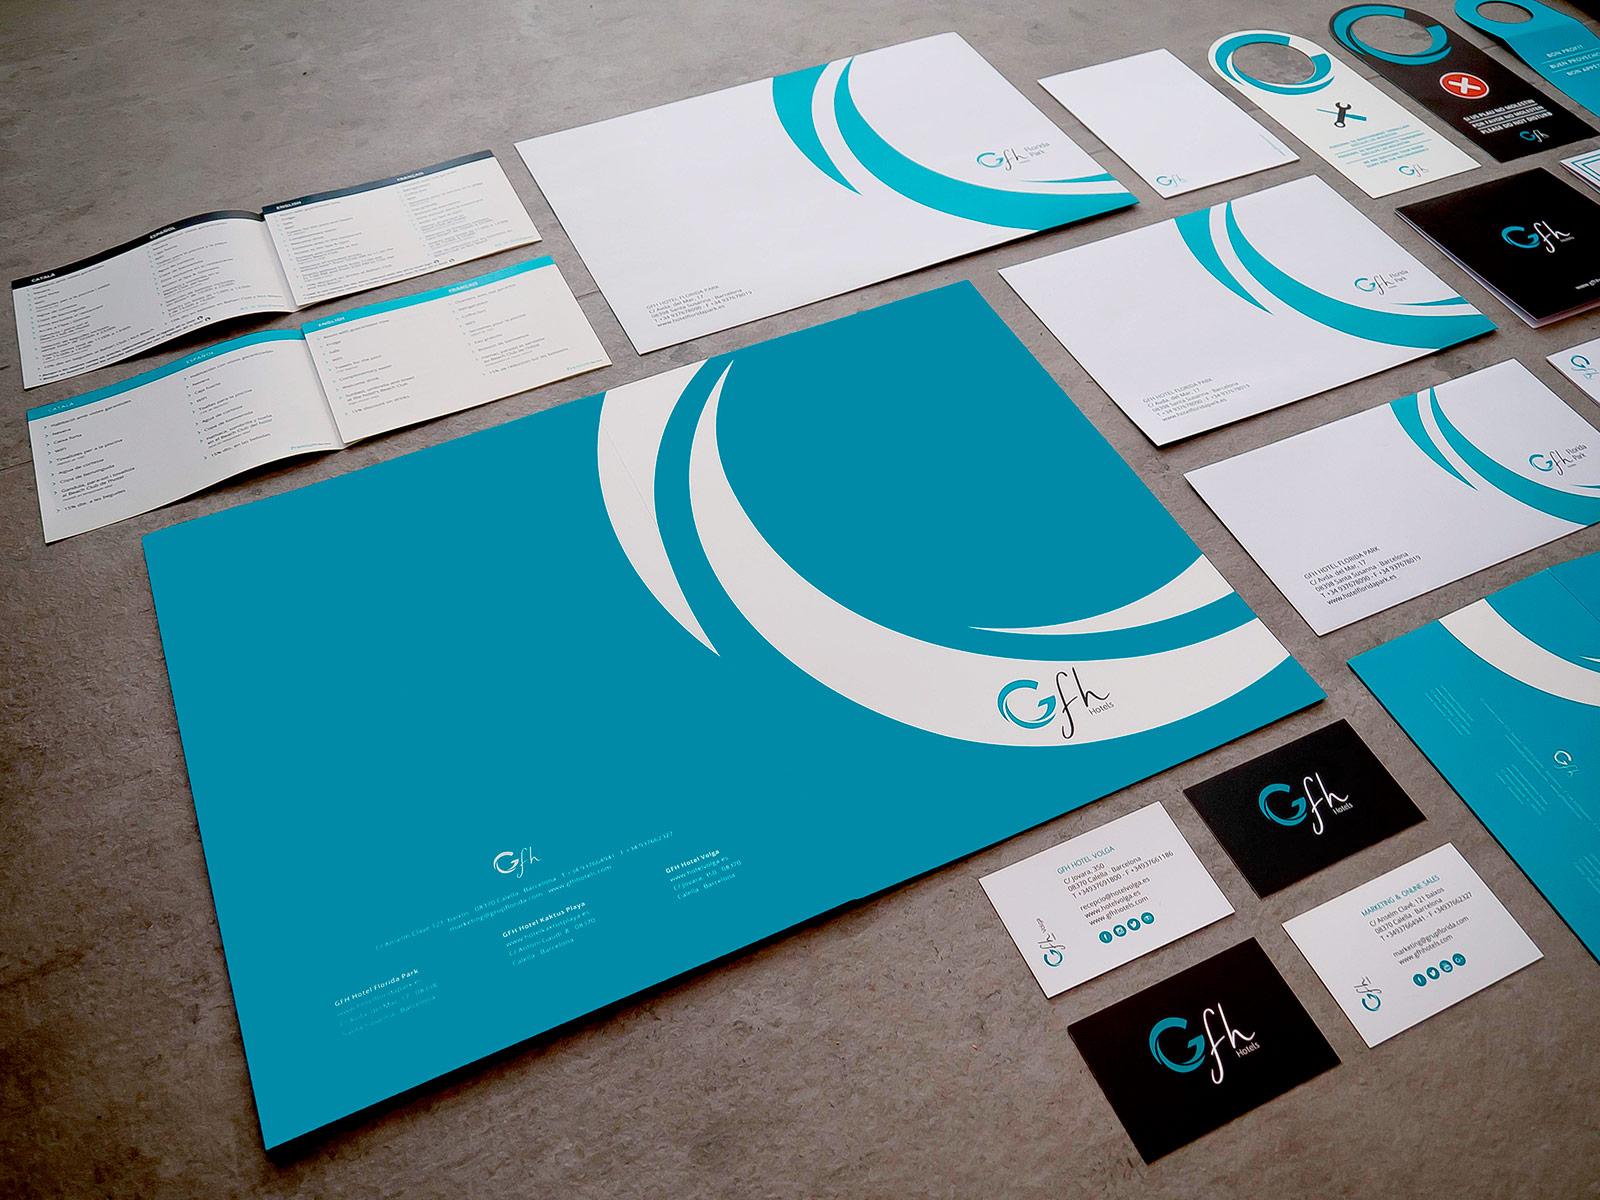 diseño grafico  Identidad corporativa     5